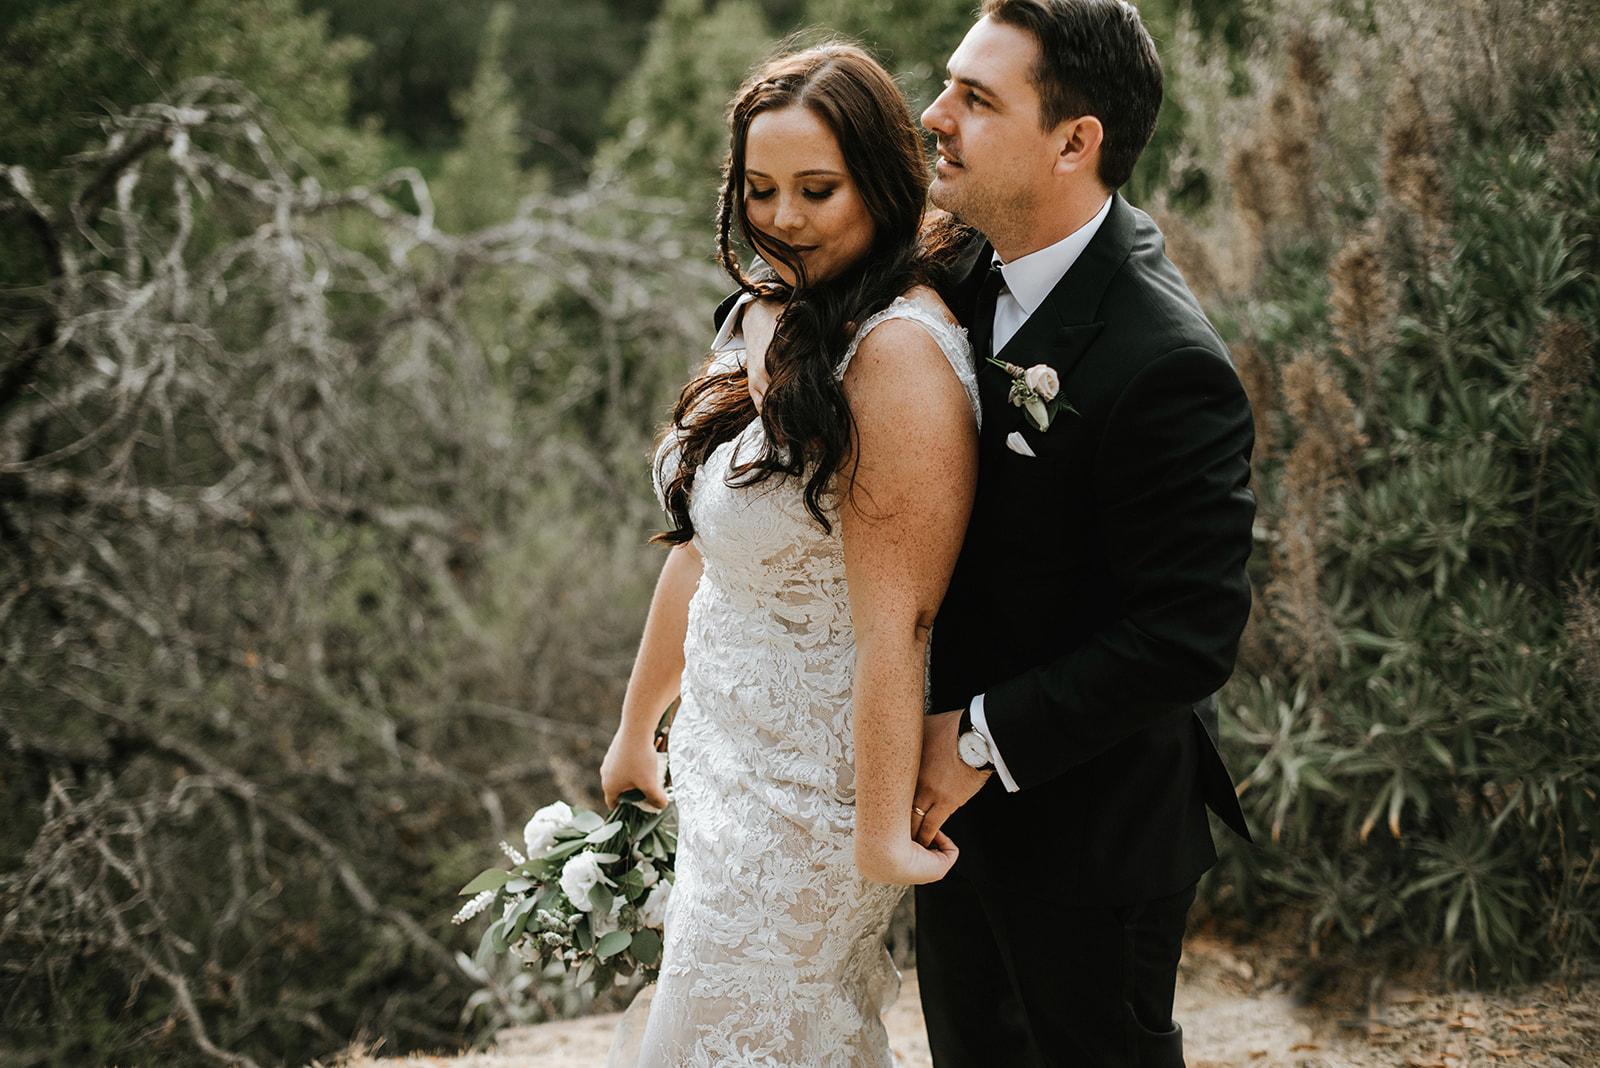 berger-wedding-470.jpg